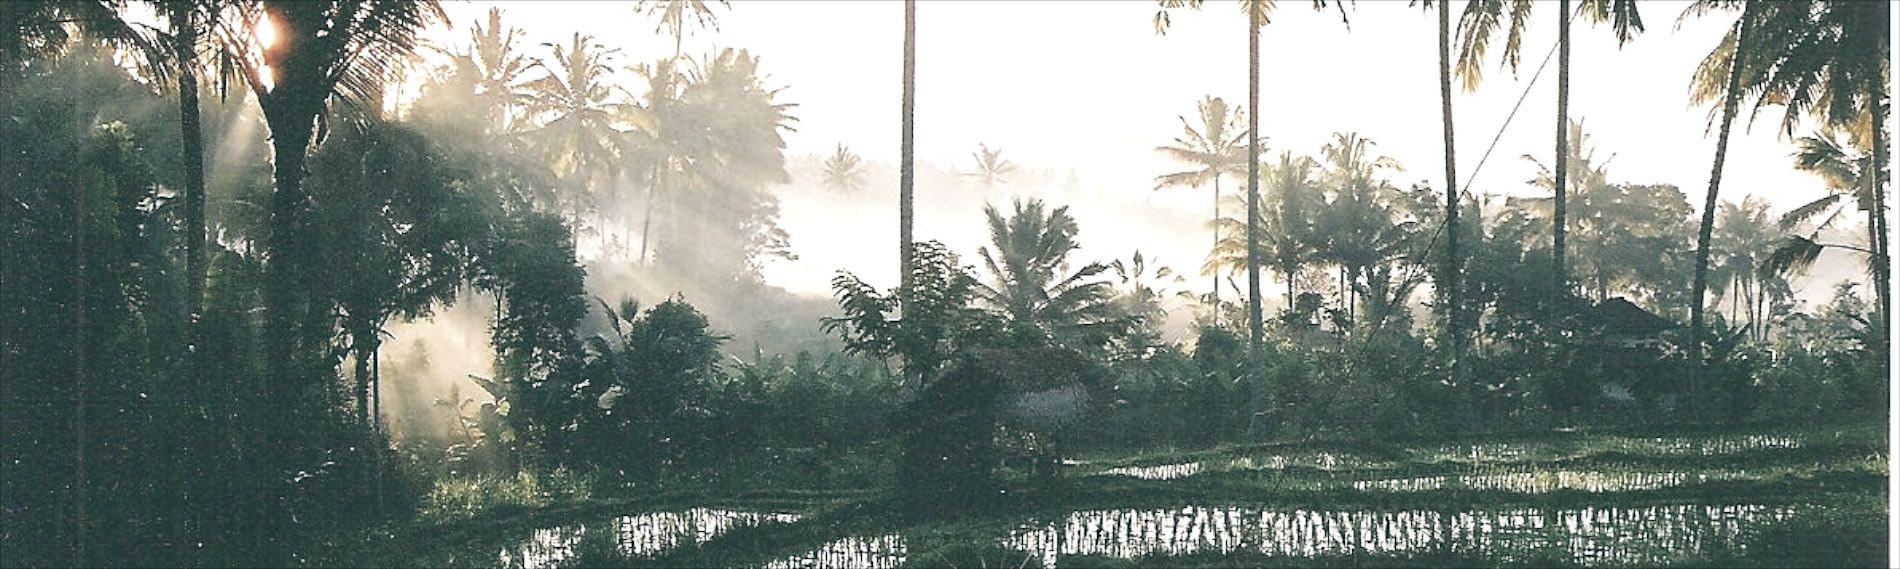 https://mlcb8szwyxfv.i.optimole.com/tTCGqh8-k0N3EP3c/w:auto/h:auto/q:90/https://www.uniqueteambuilding.com.au/wp-content/uploads/2014/10/Bali-retreat-rot-3.jpg